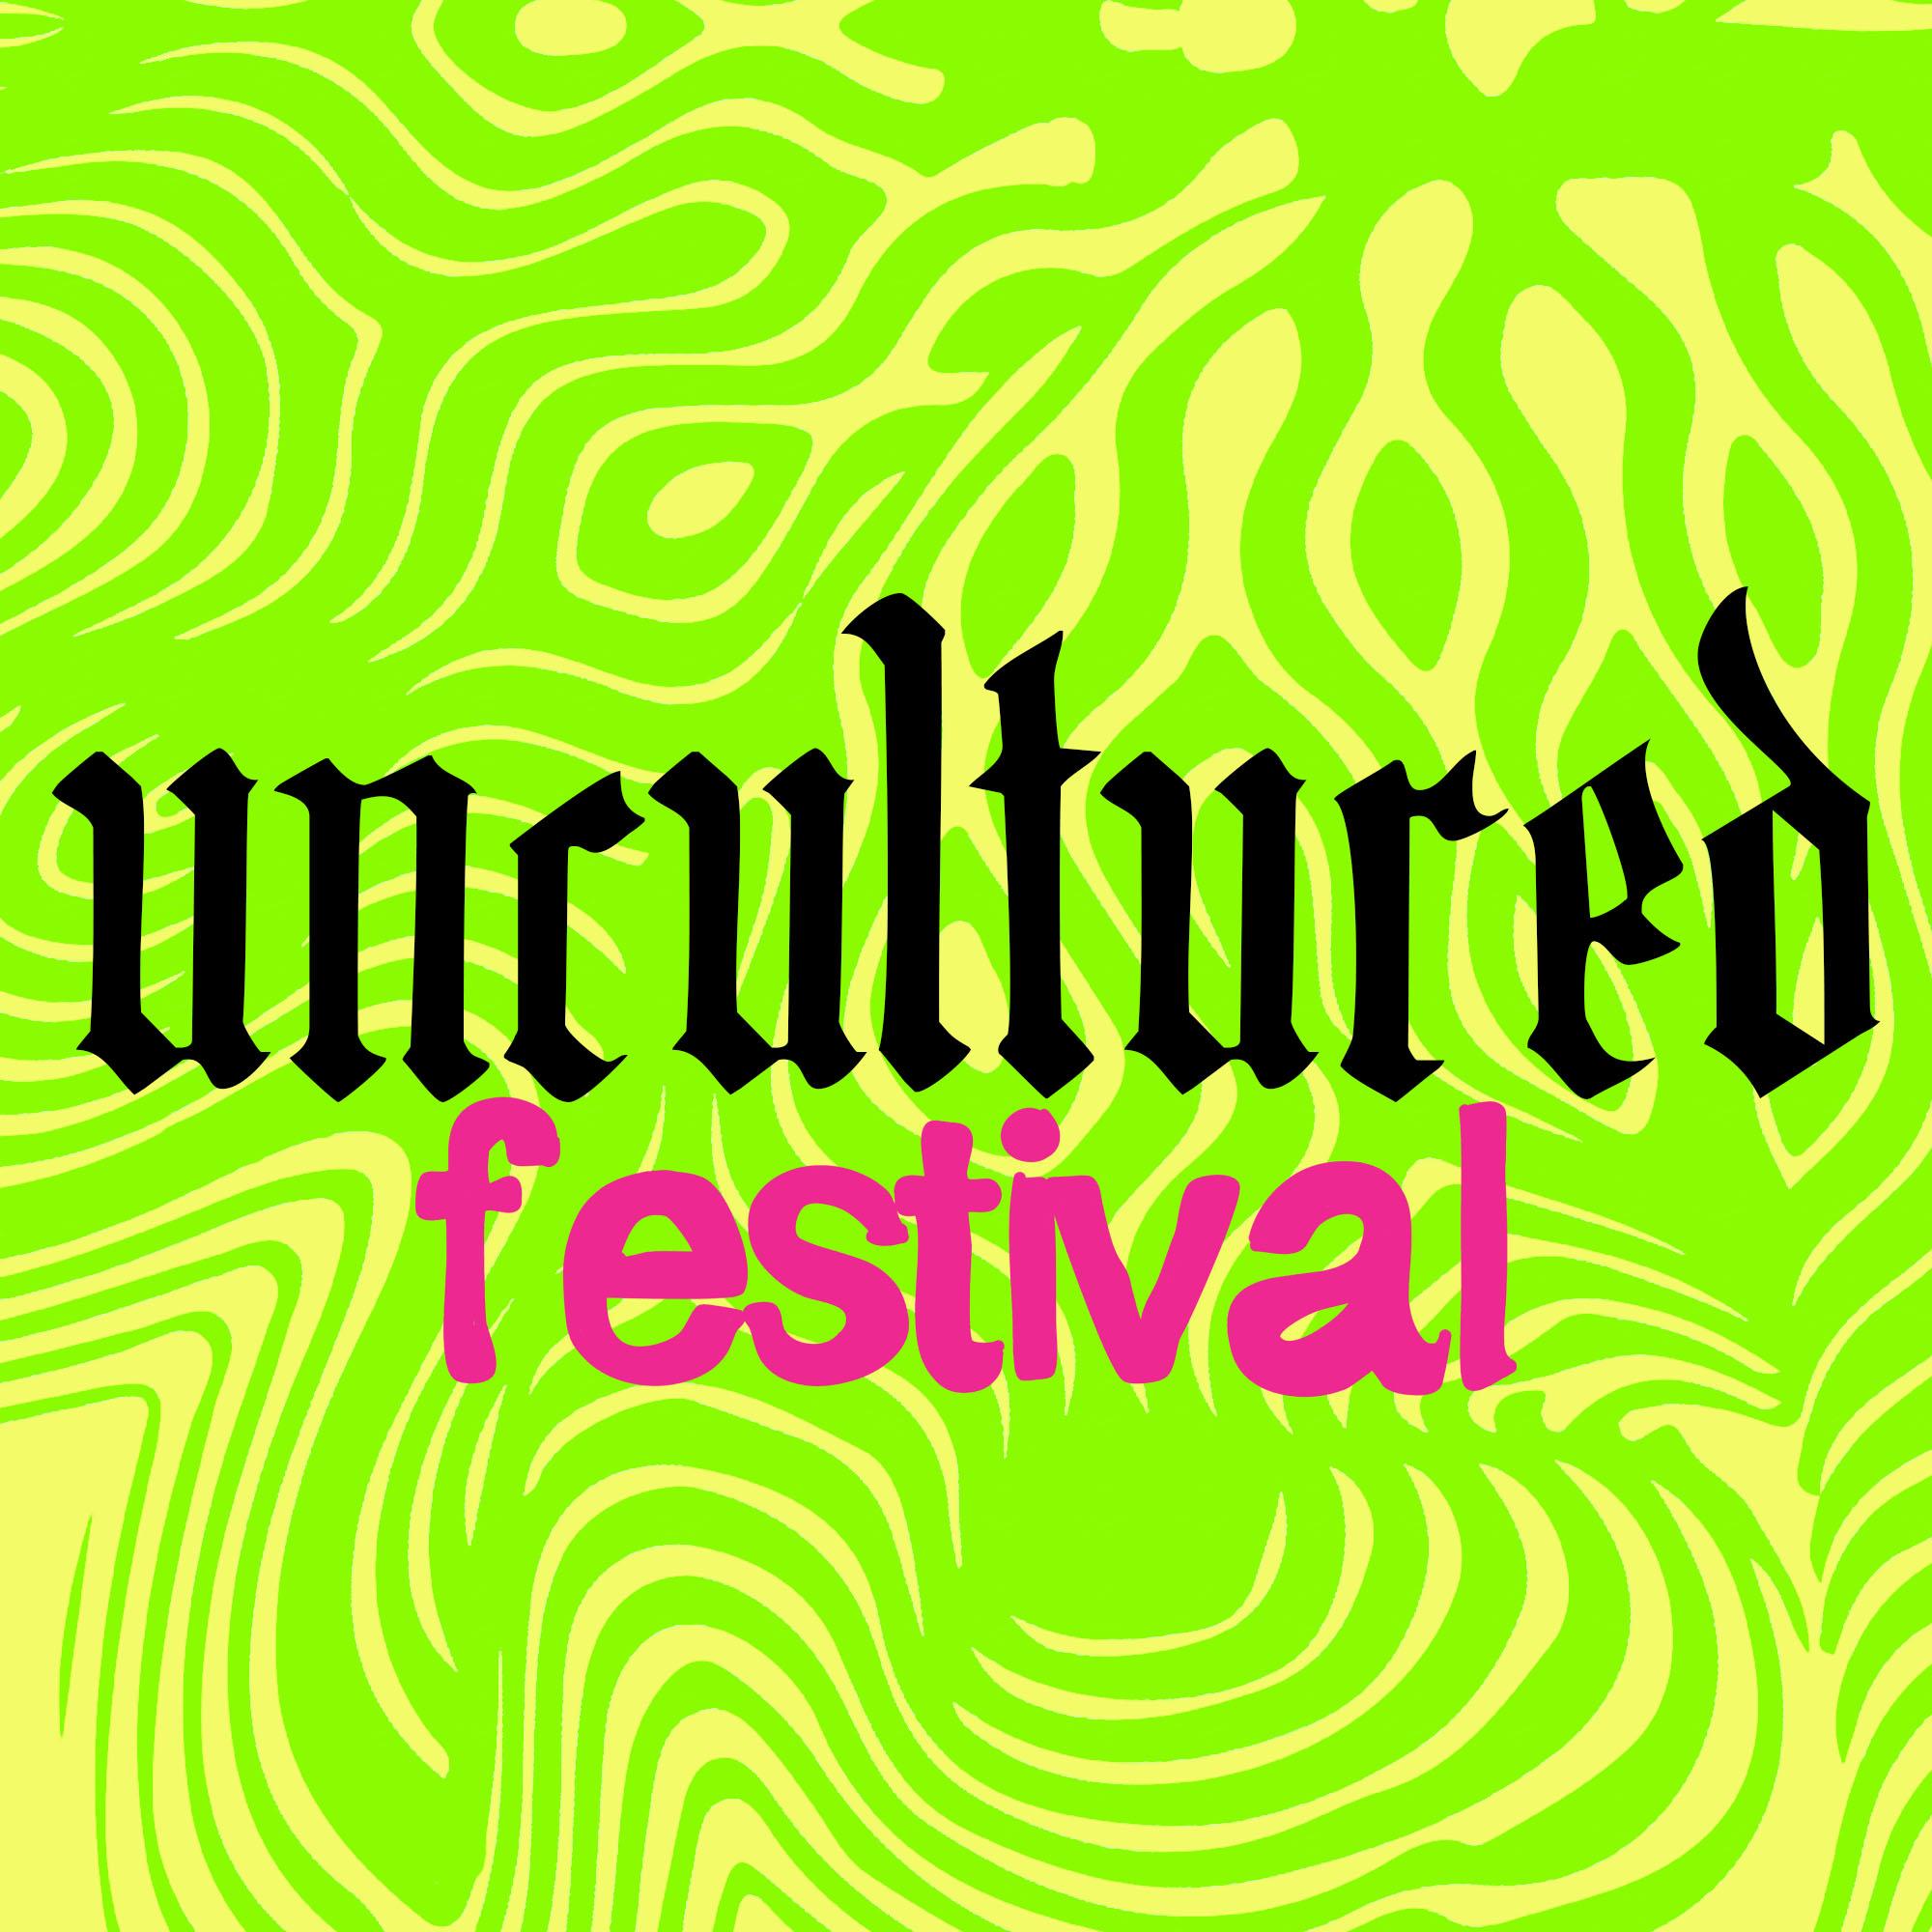 Uncultured Festival